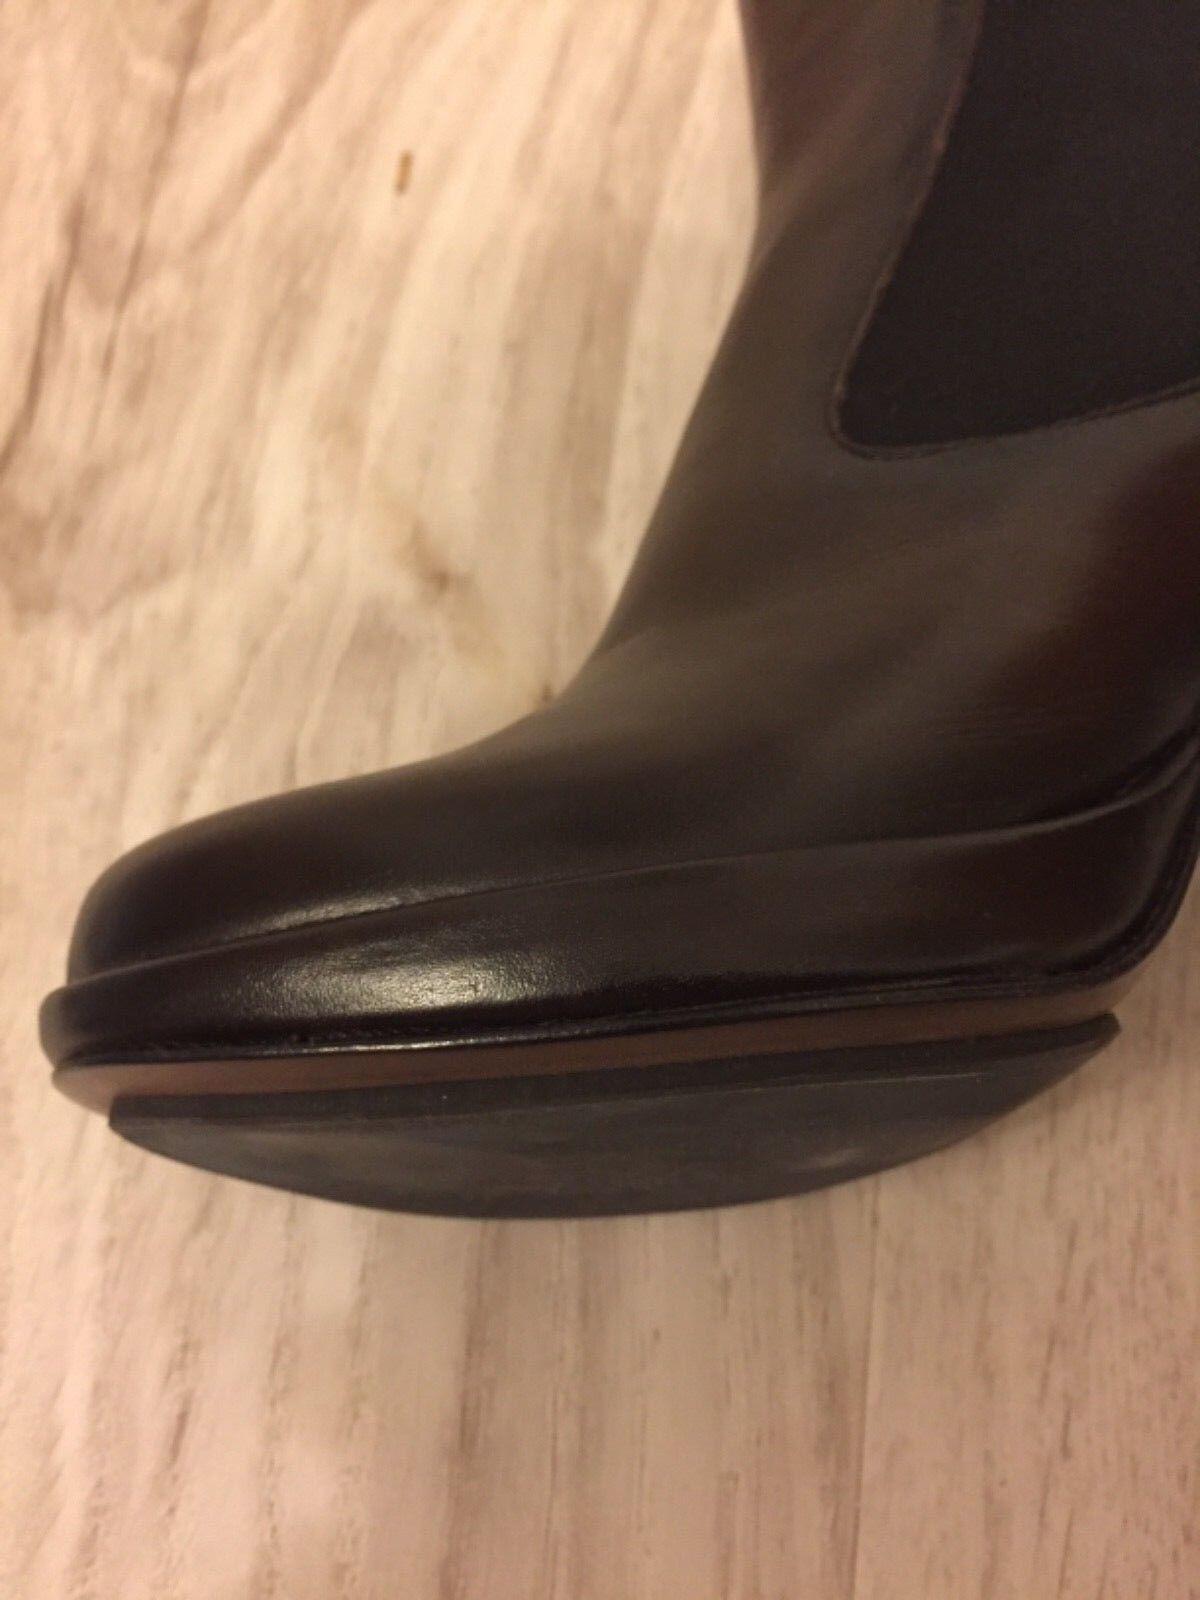 Stiefeletten, Gr. Plateau, 36, braun, Paco Gil, Plateau, Gr. Chelsea - Ankle Stiefel, NP ed23c8